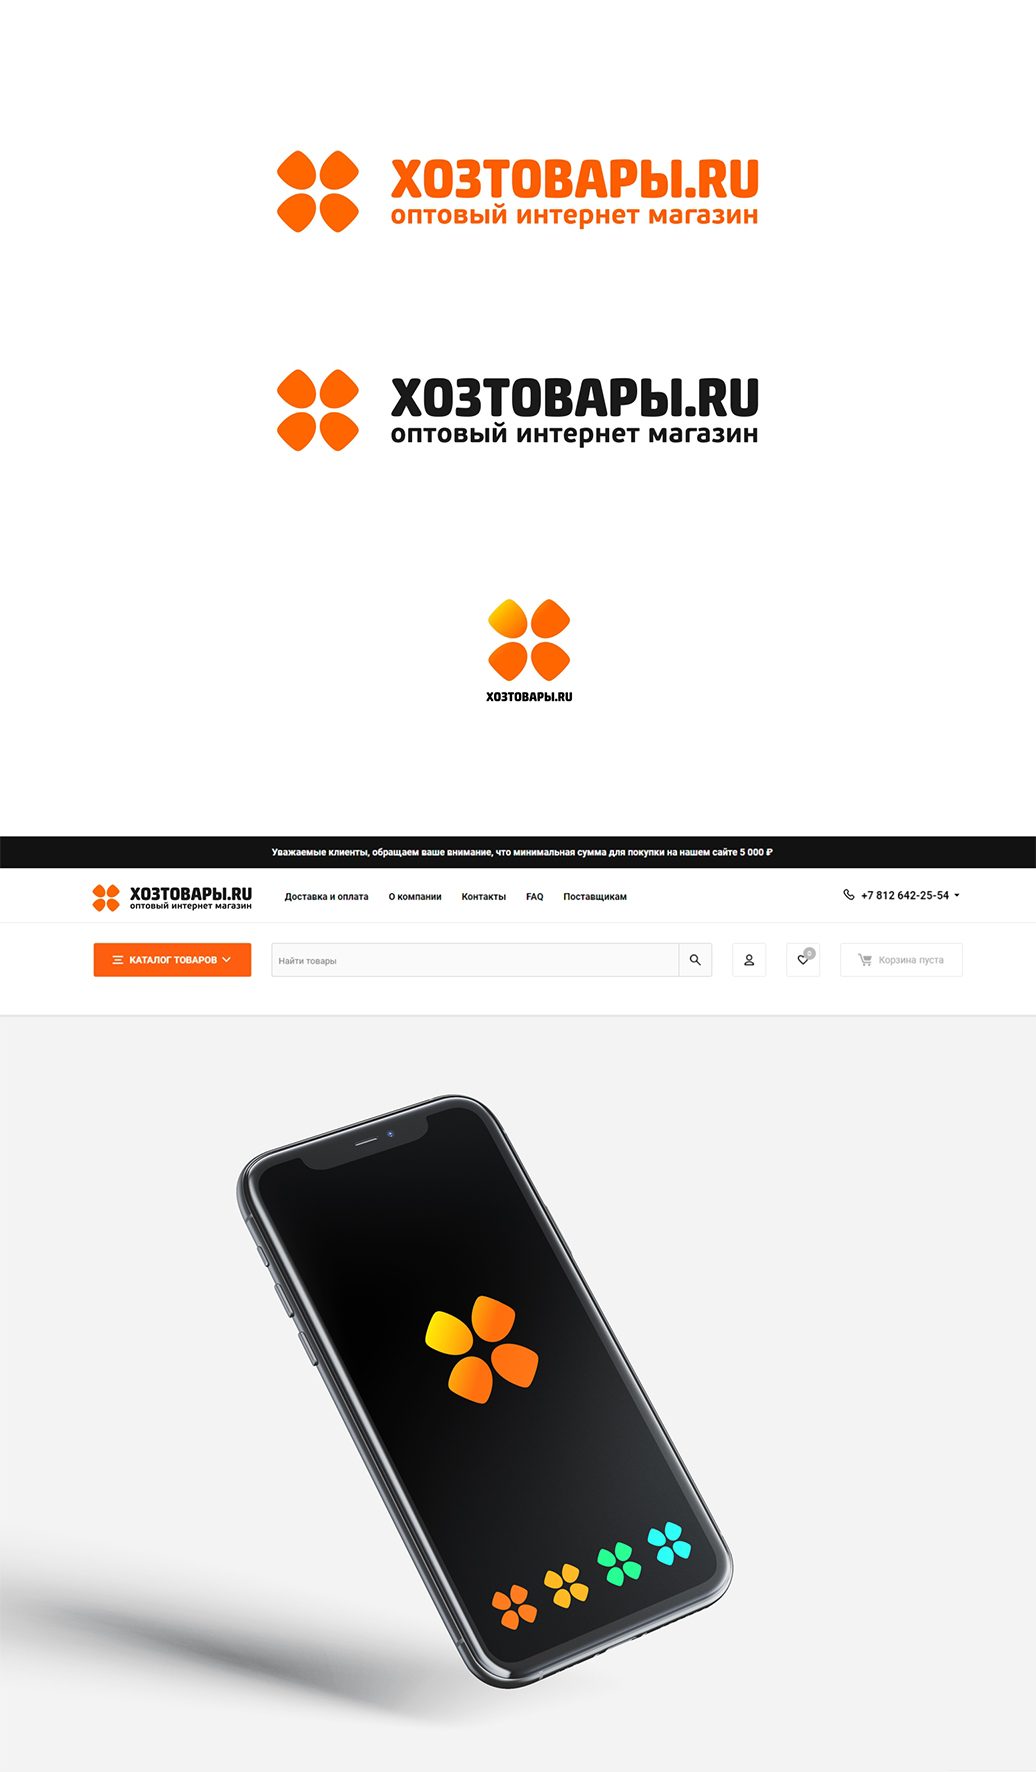 Разработка логотипа для оптового интернет-магазина «Хозтовары.ру» фото f_8126075664334534.jpg